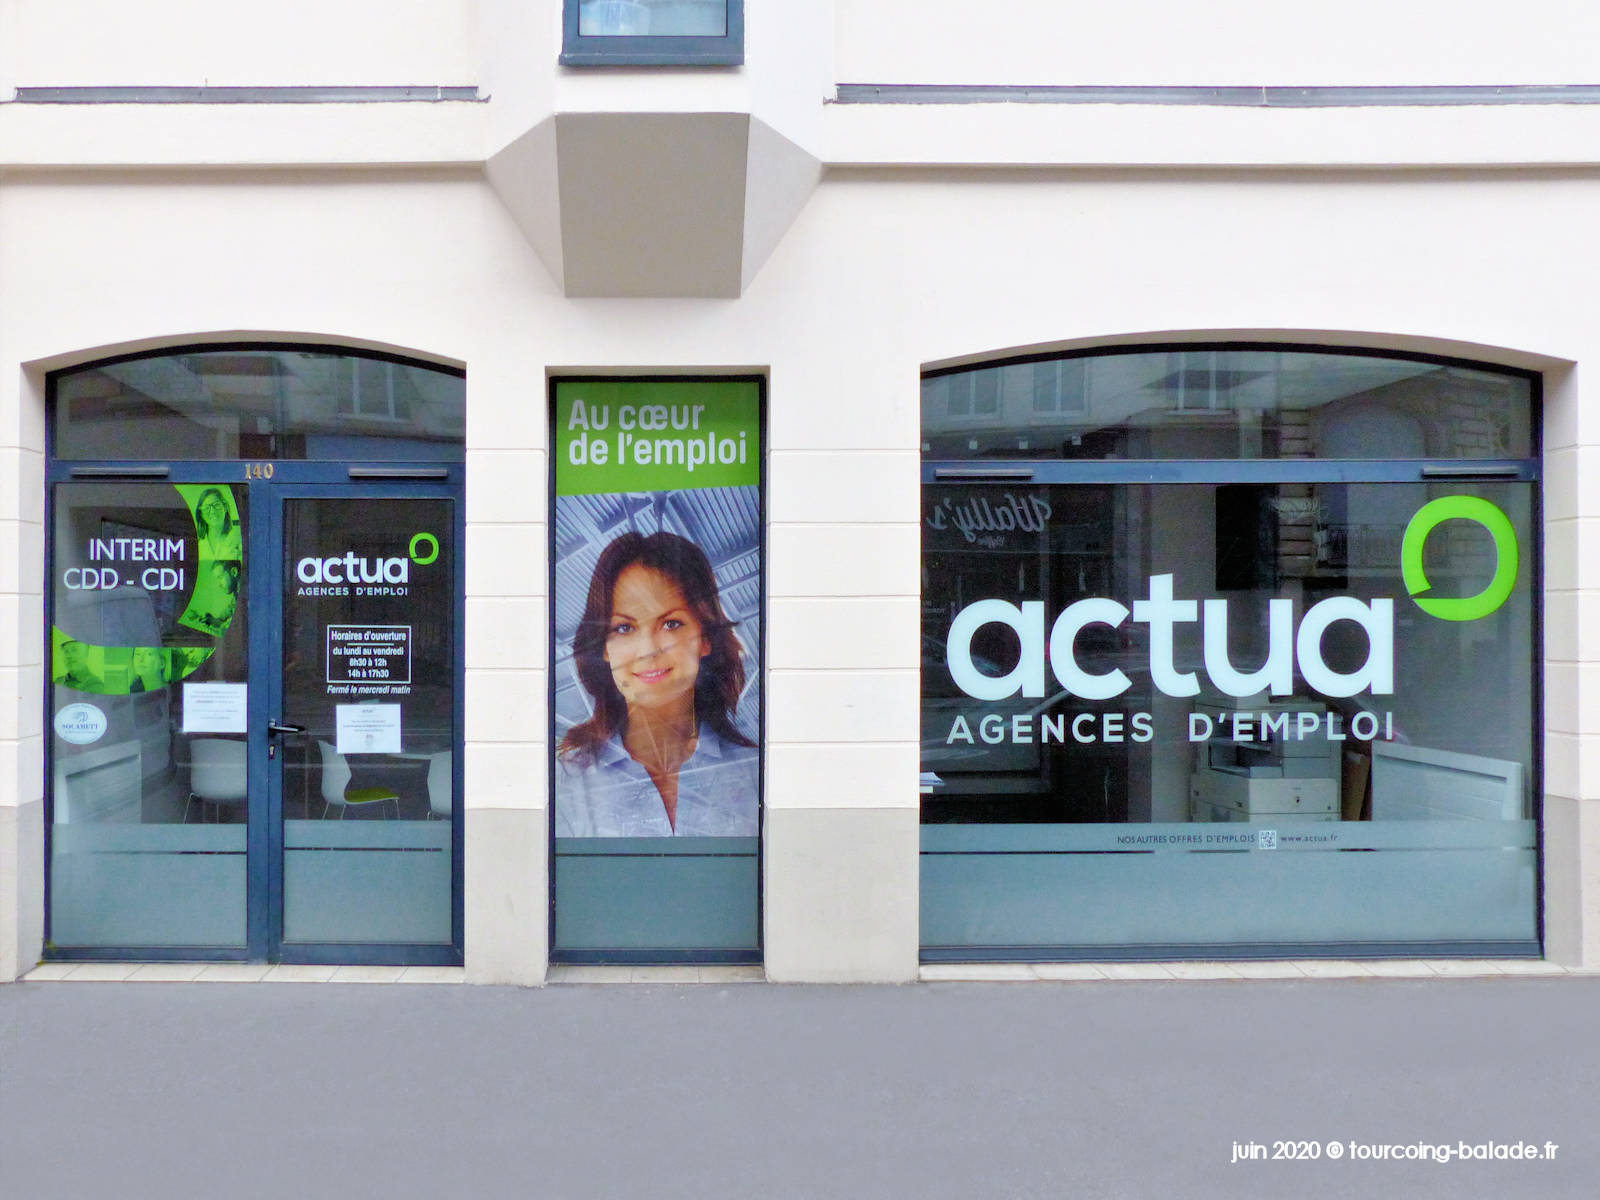 Agence Actua Emploi, Lille, 2020